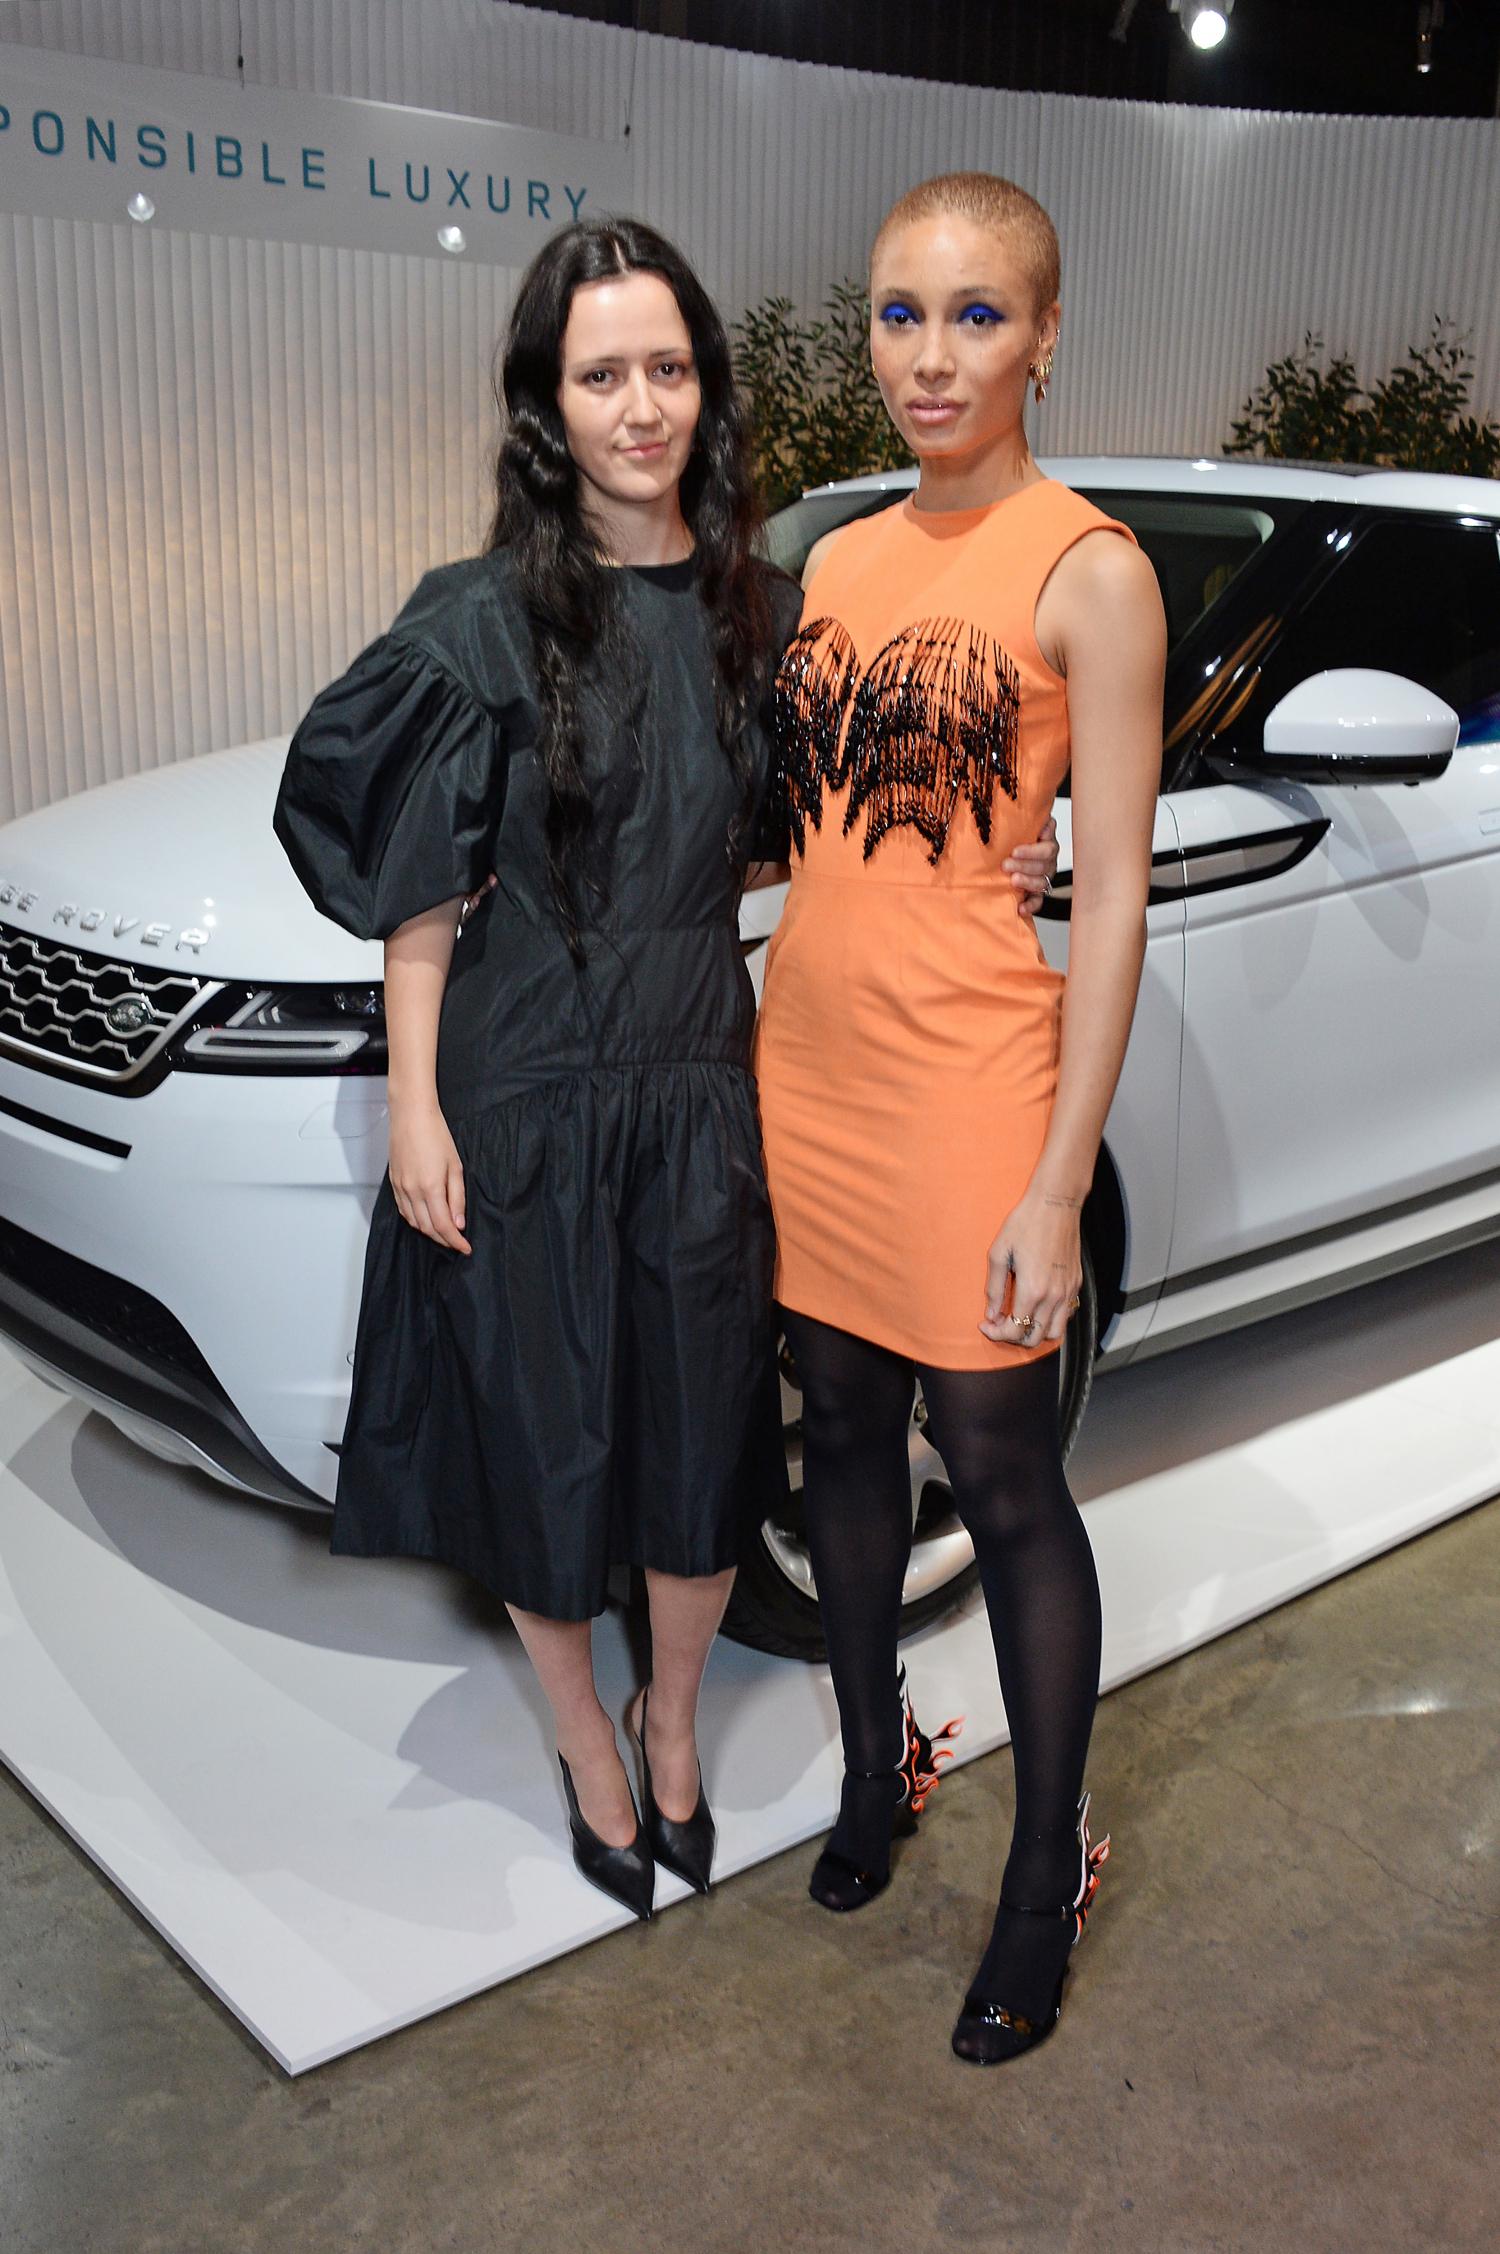 Introducing the New Range Rover Evoque – Adwoa Aboah